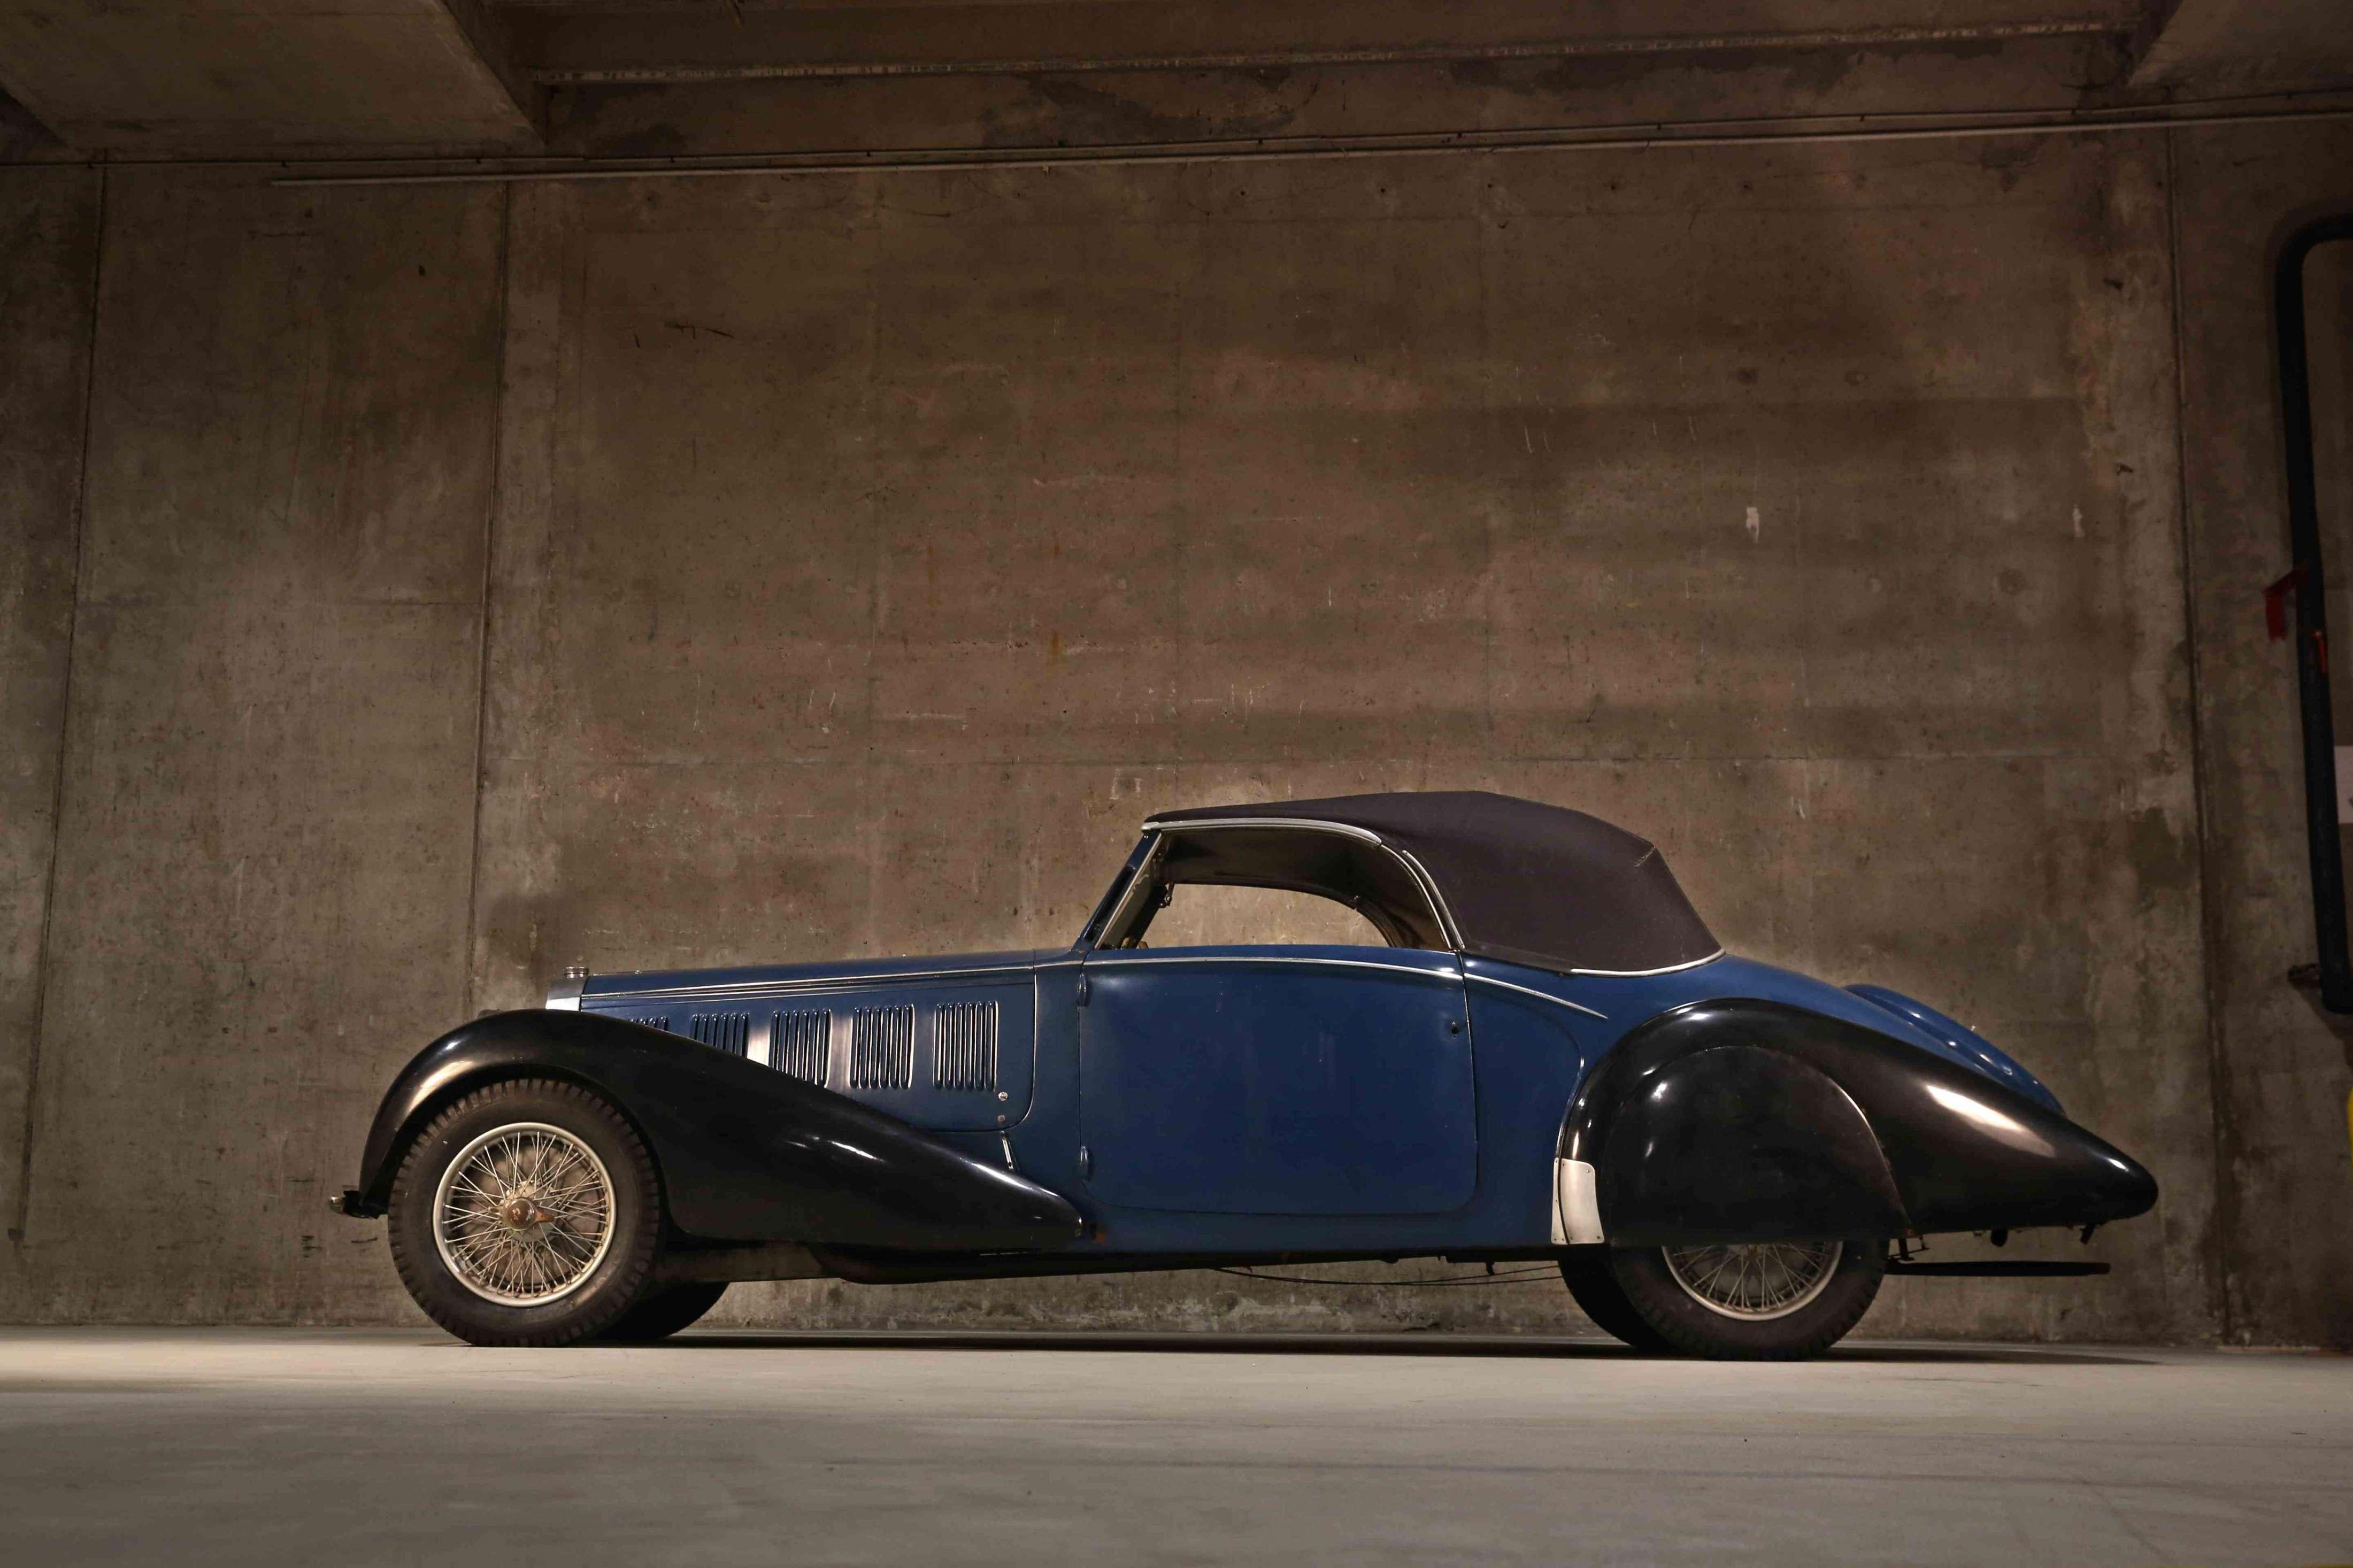 1937 Bugatti Type 57 Cabriolet par Graber side profile